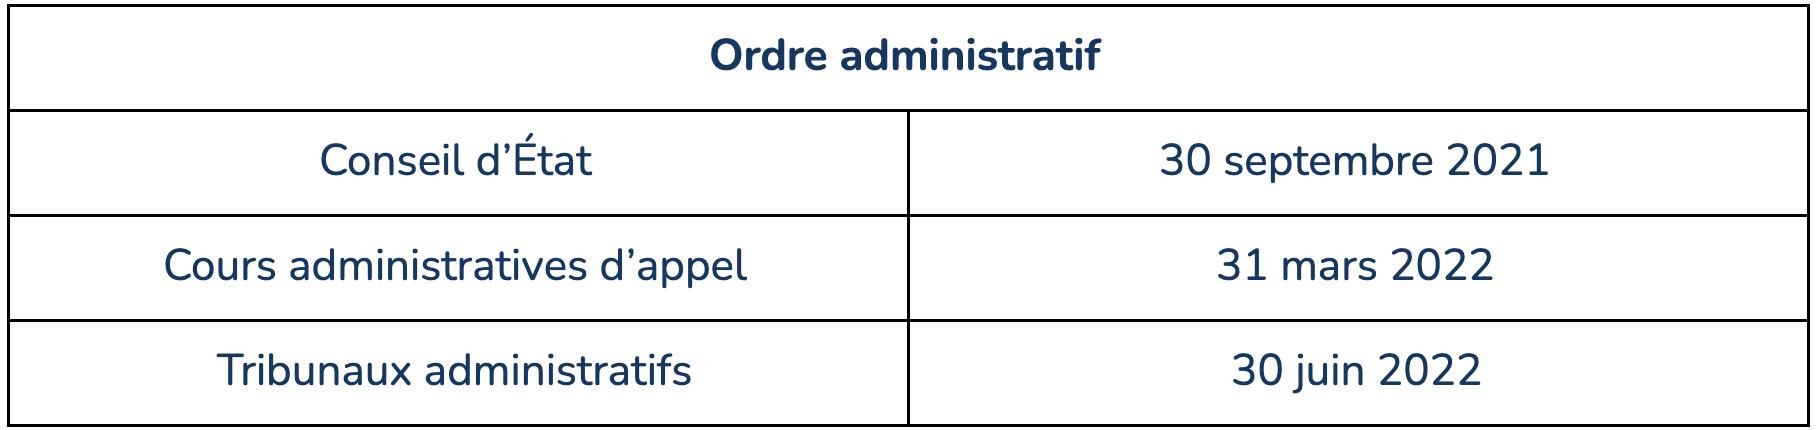 open data administratif